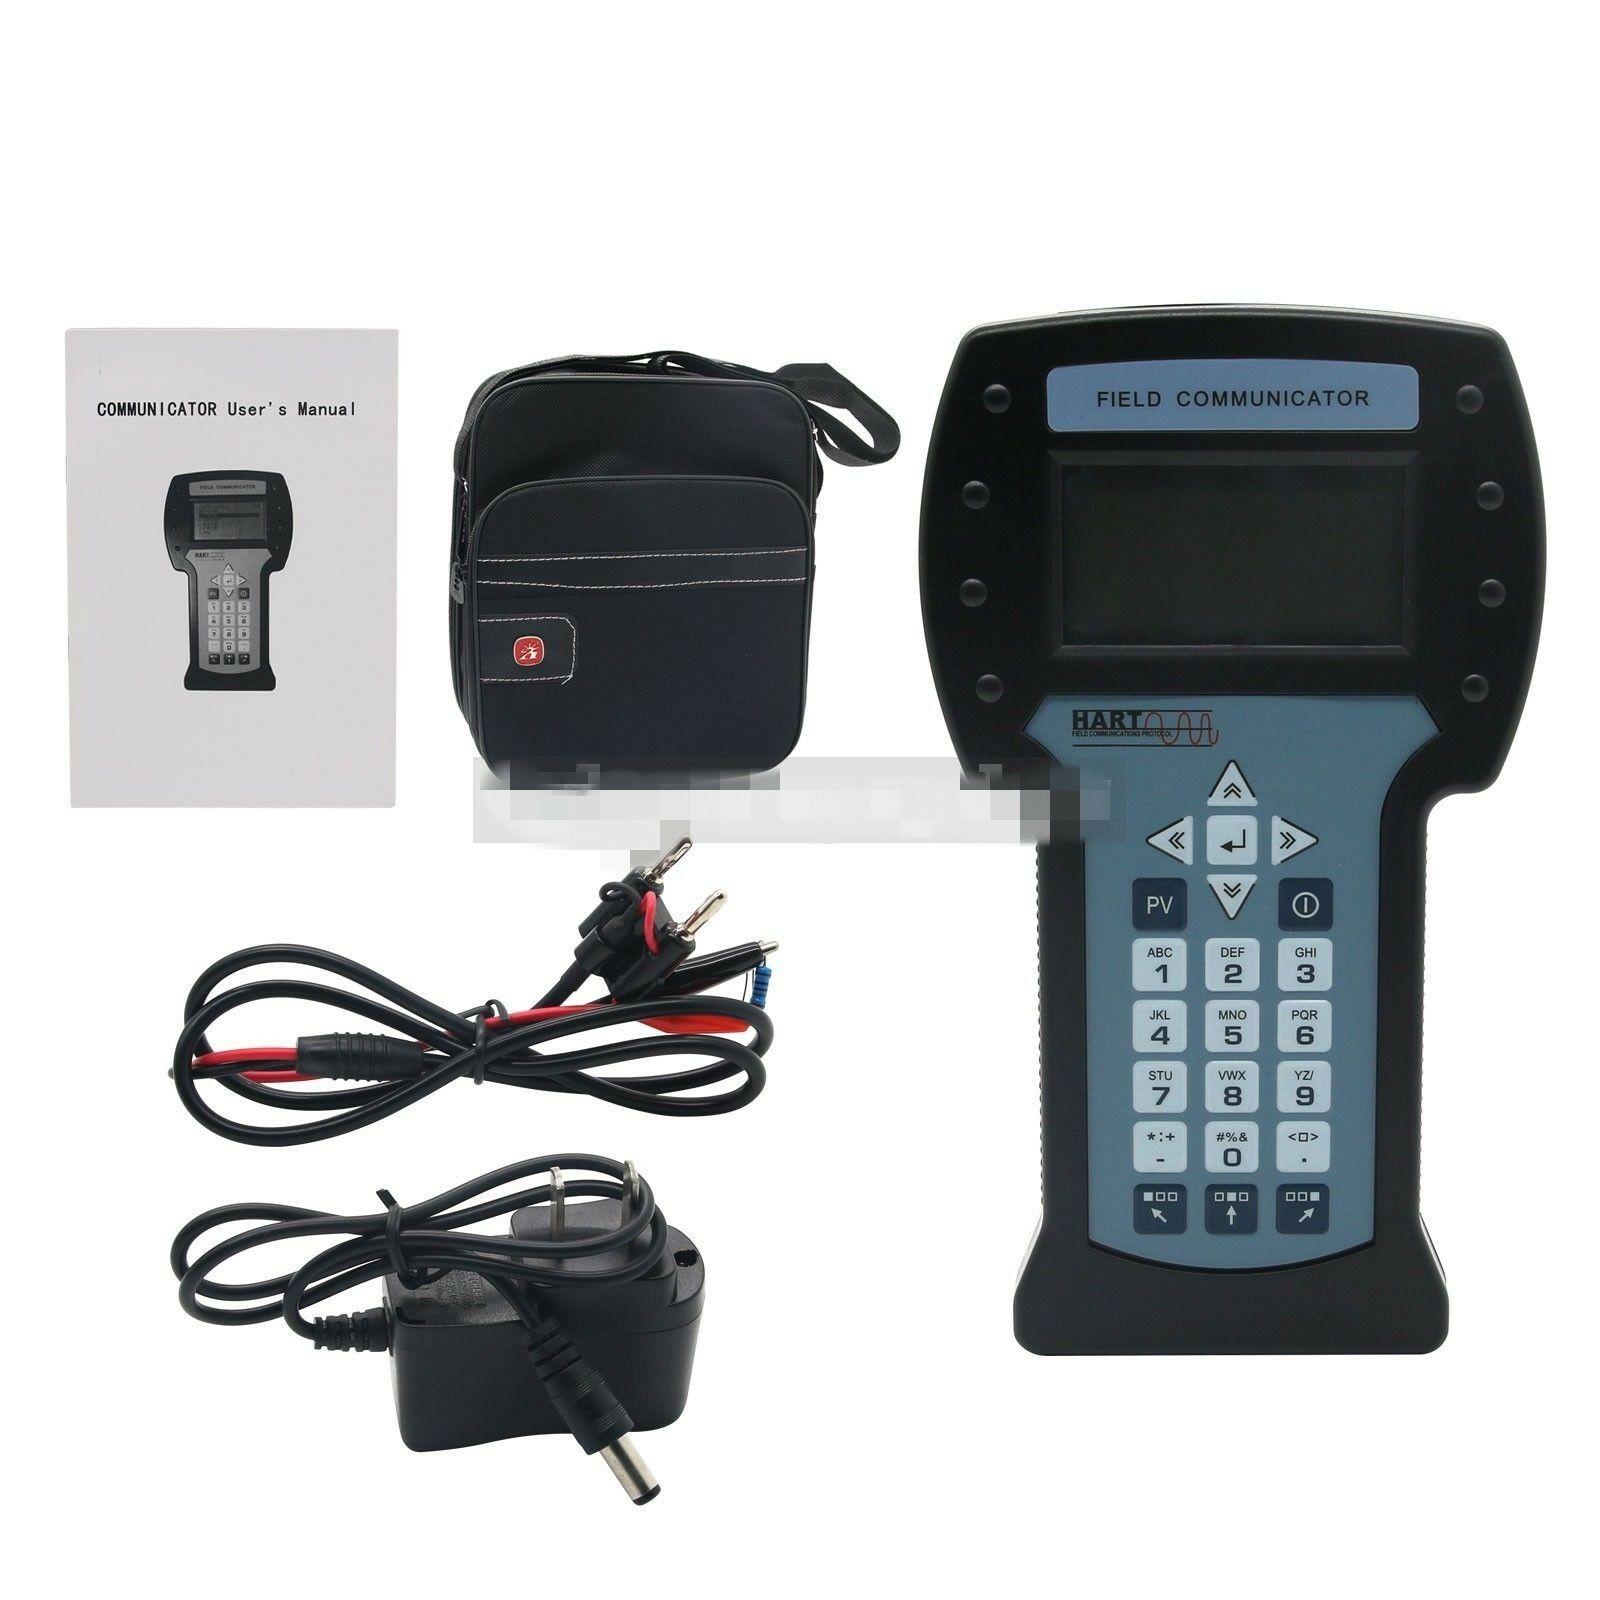 Hart475 Hart Field Communicator For Pressure Temperature Transmitter Calibration Handheld Hart Field + Manual